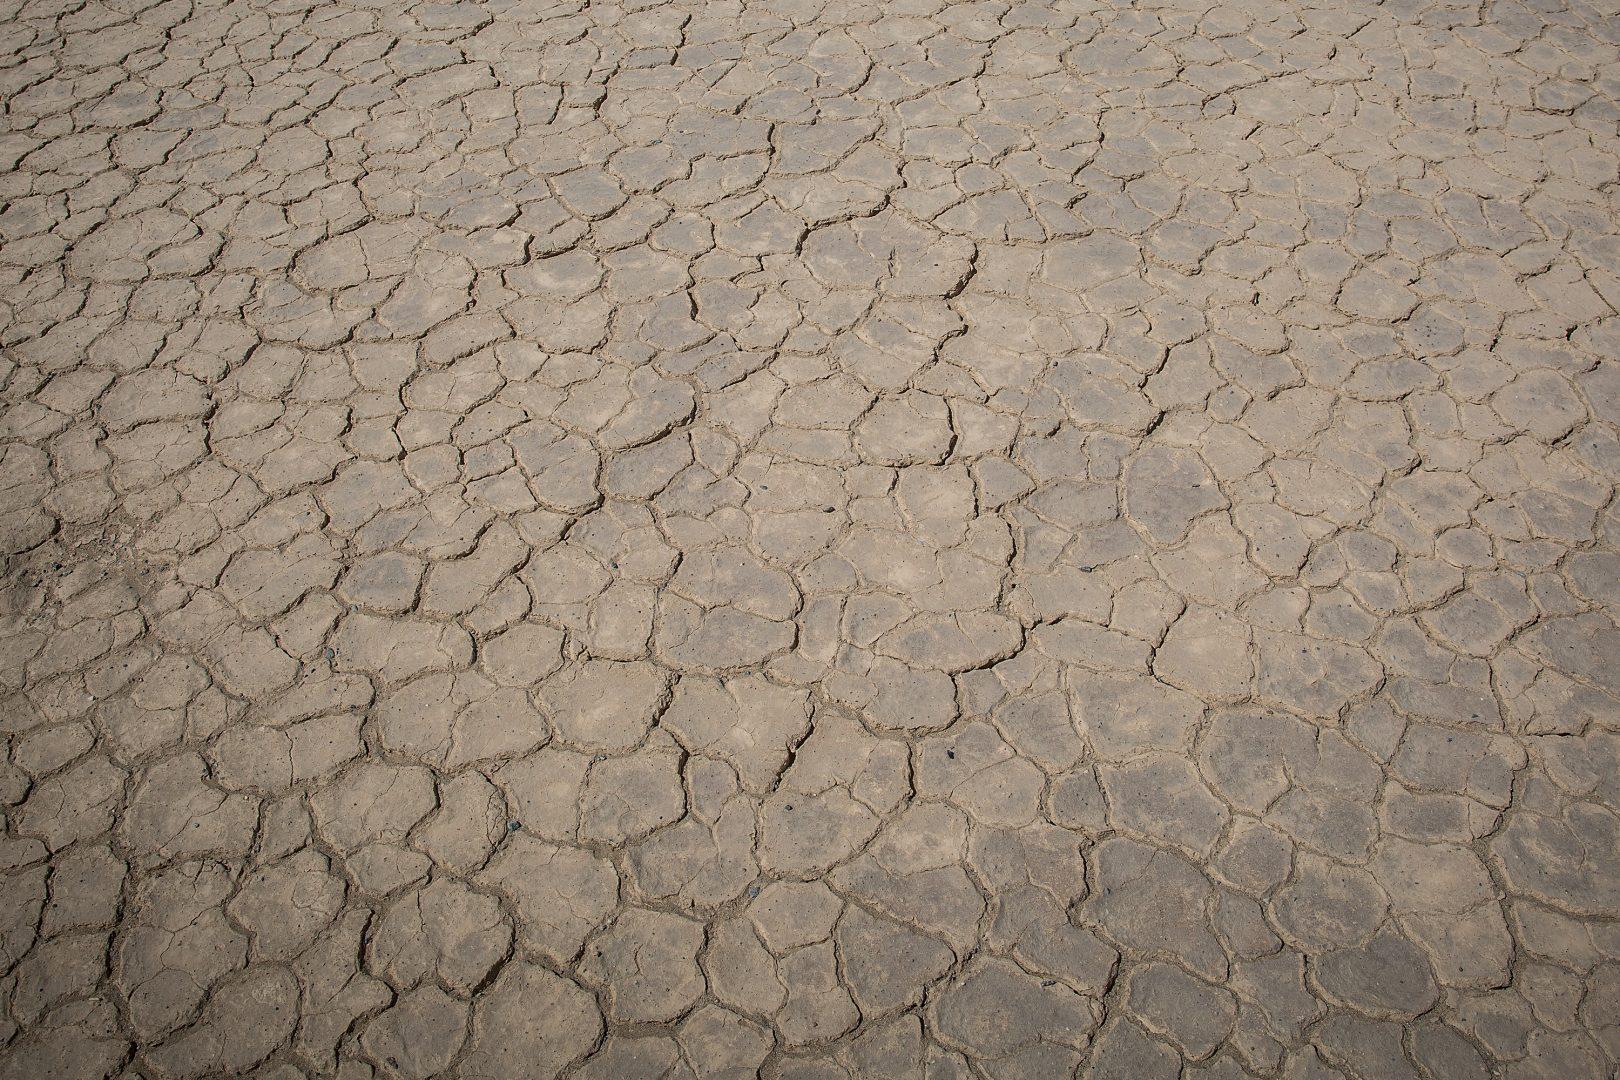 Death Valley floor